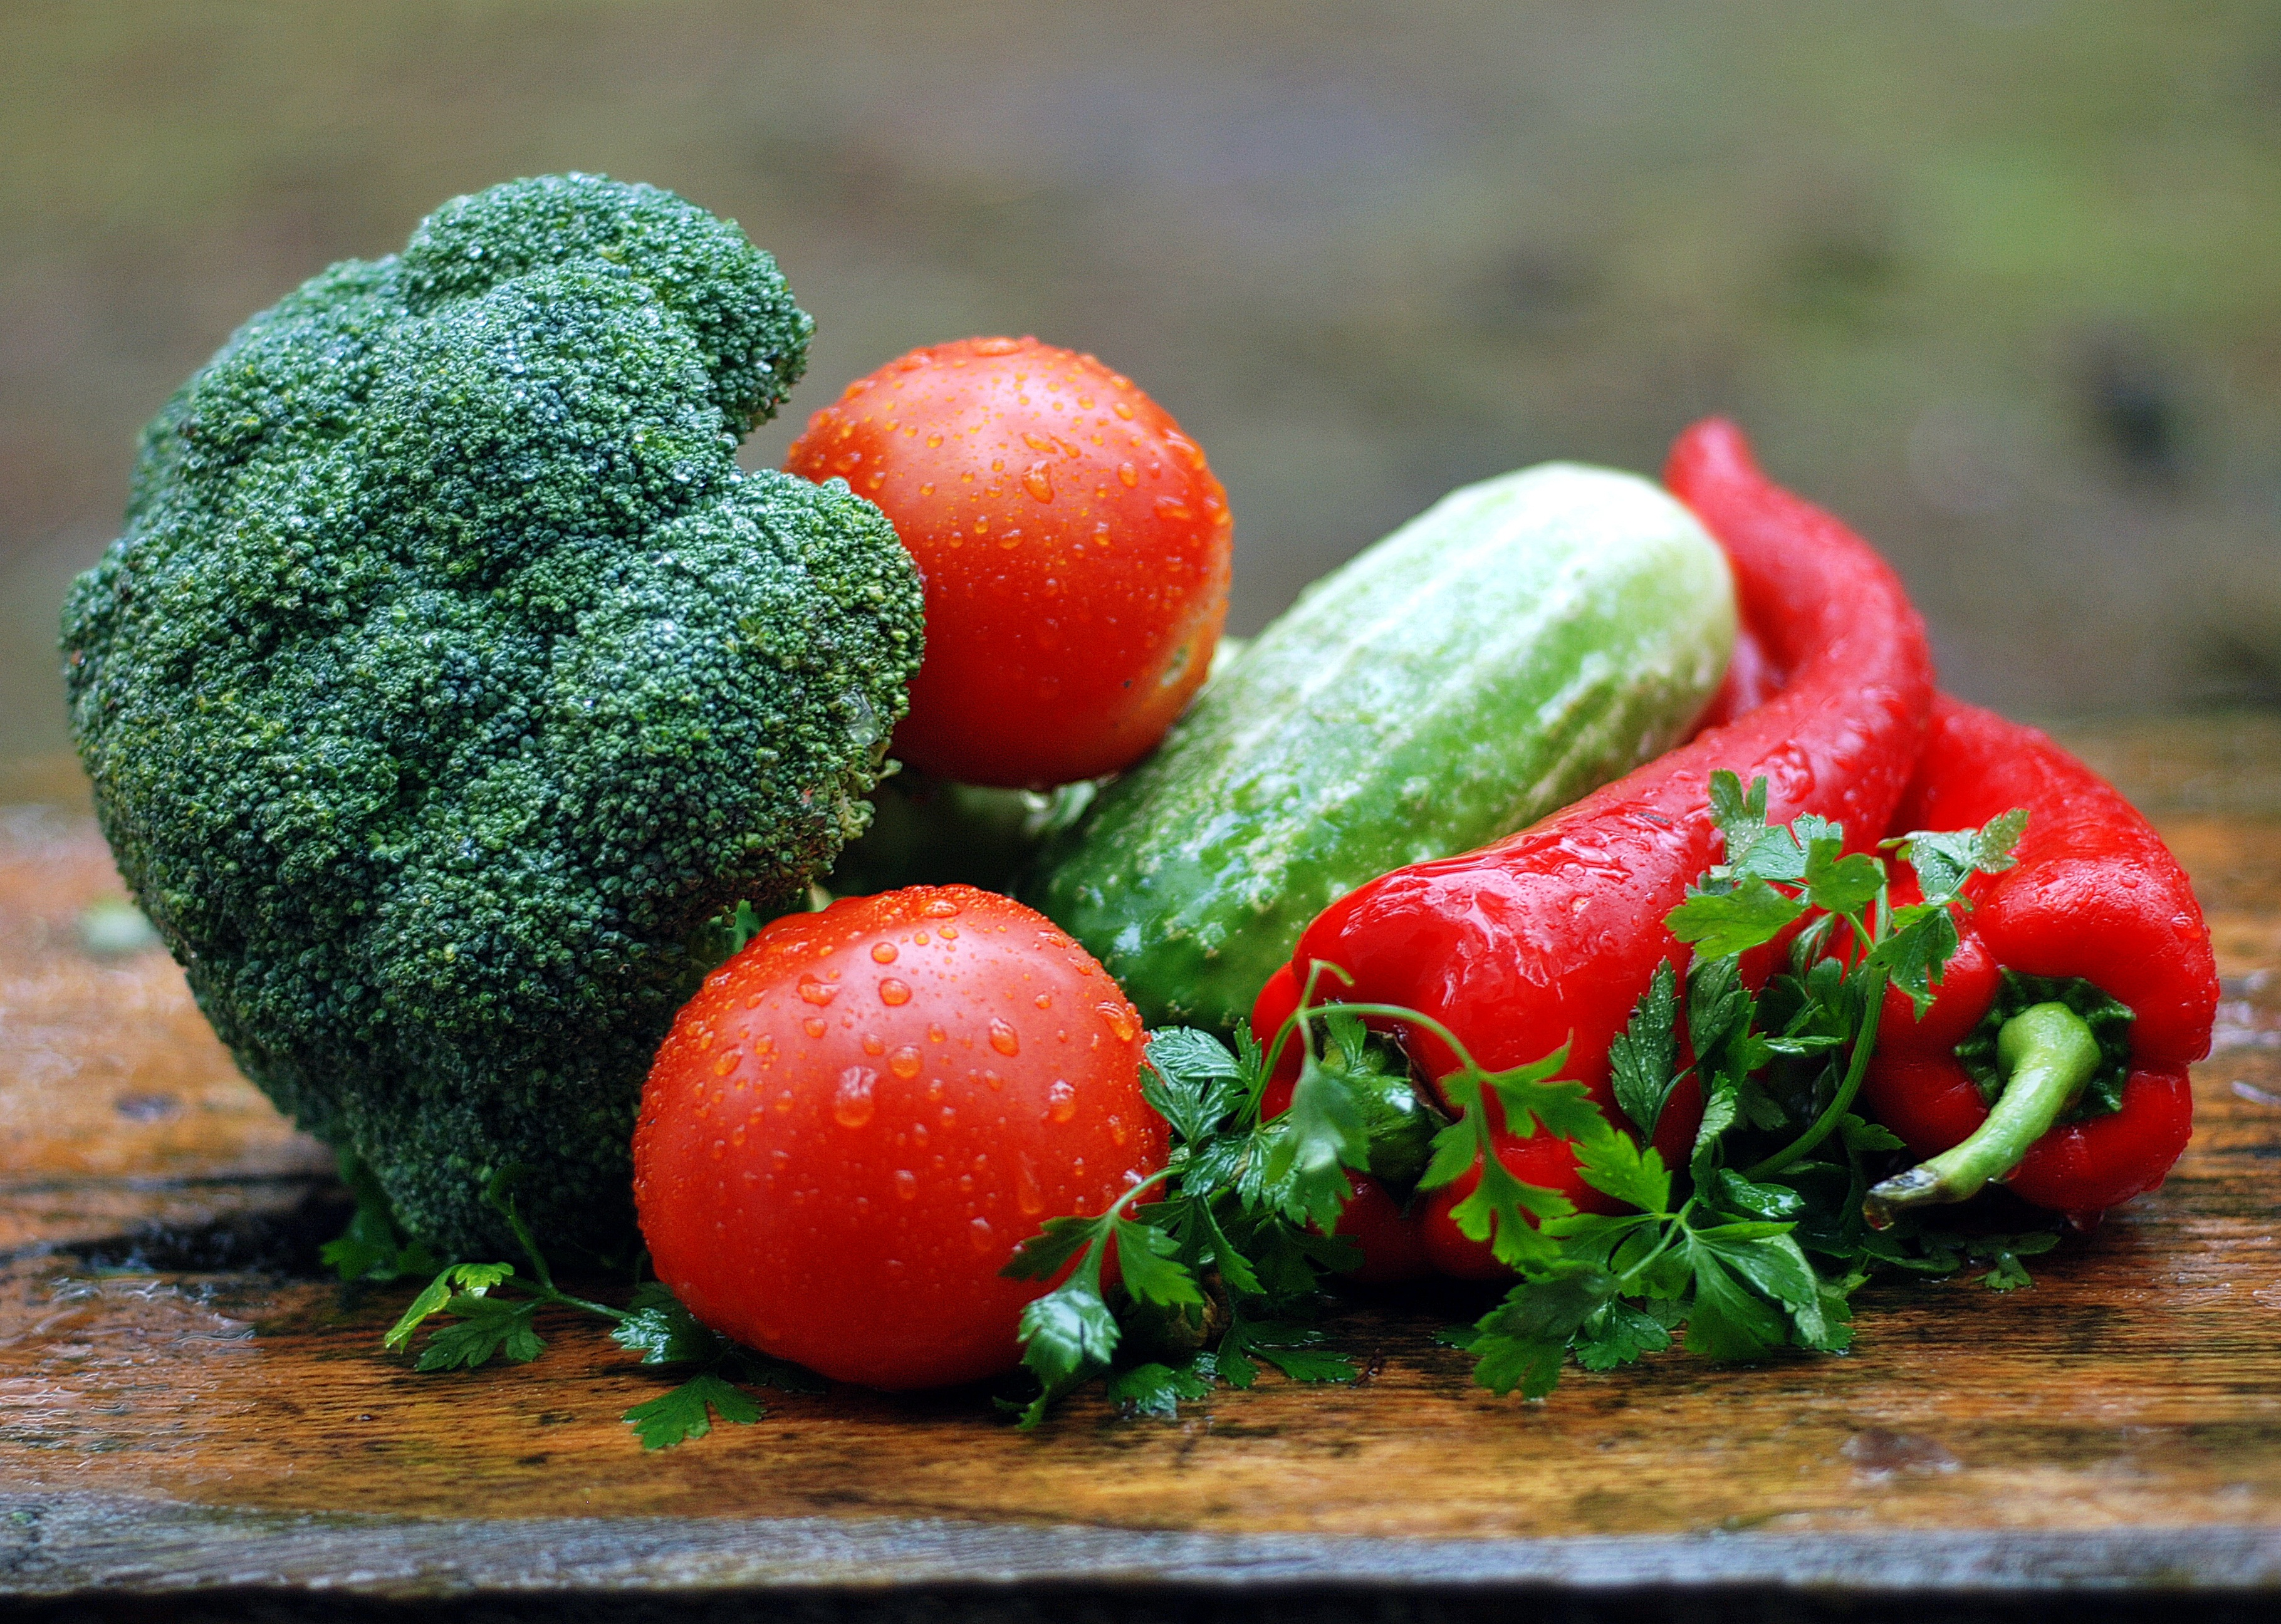 https://static.pexels.com/photos/162776/vegetables-healthy-nutrition-kitchen-cooking-162776.jpeg